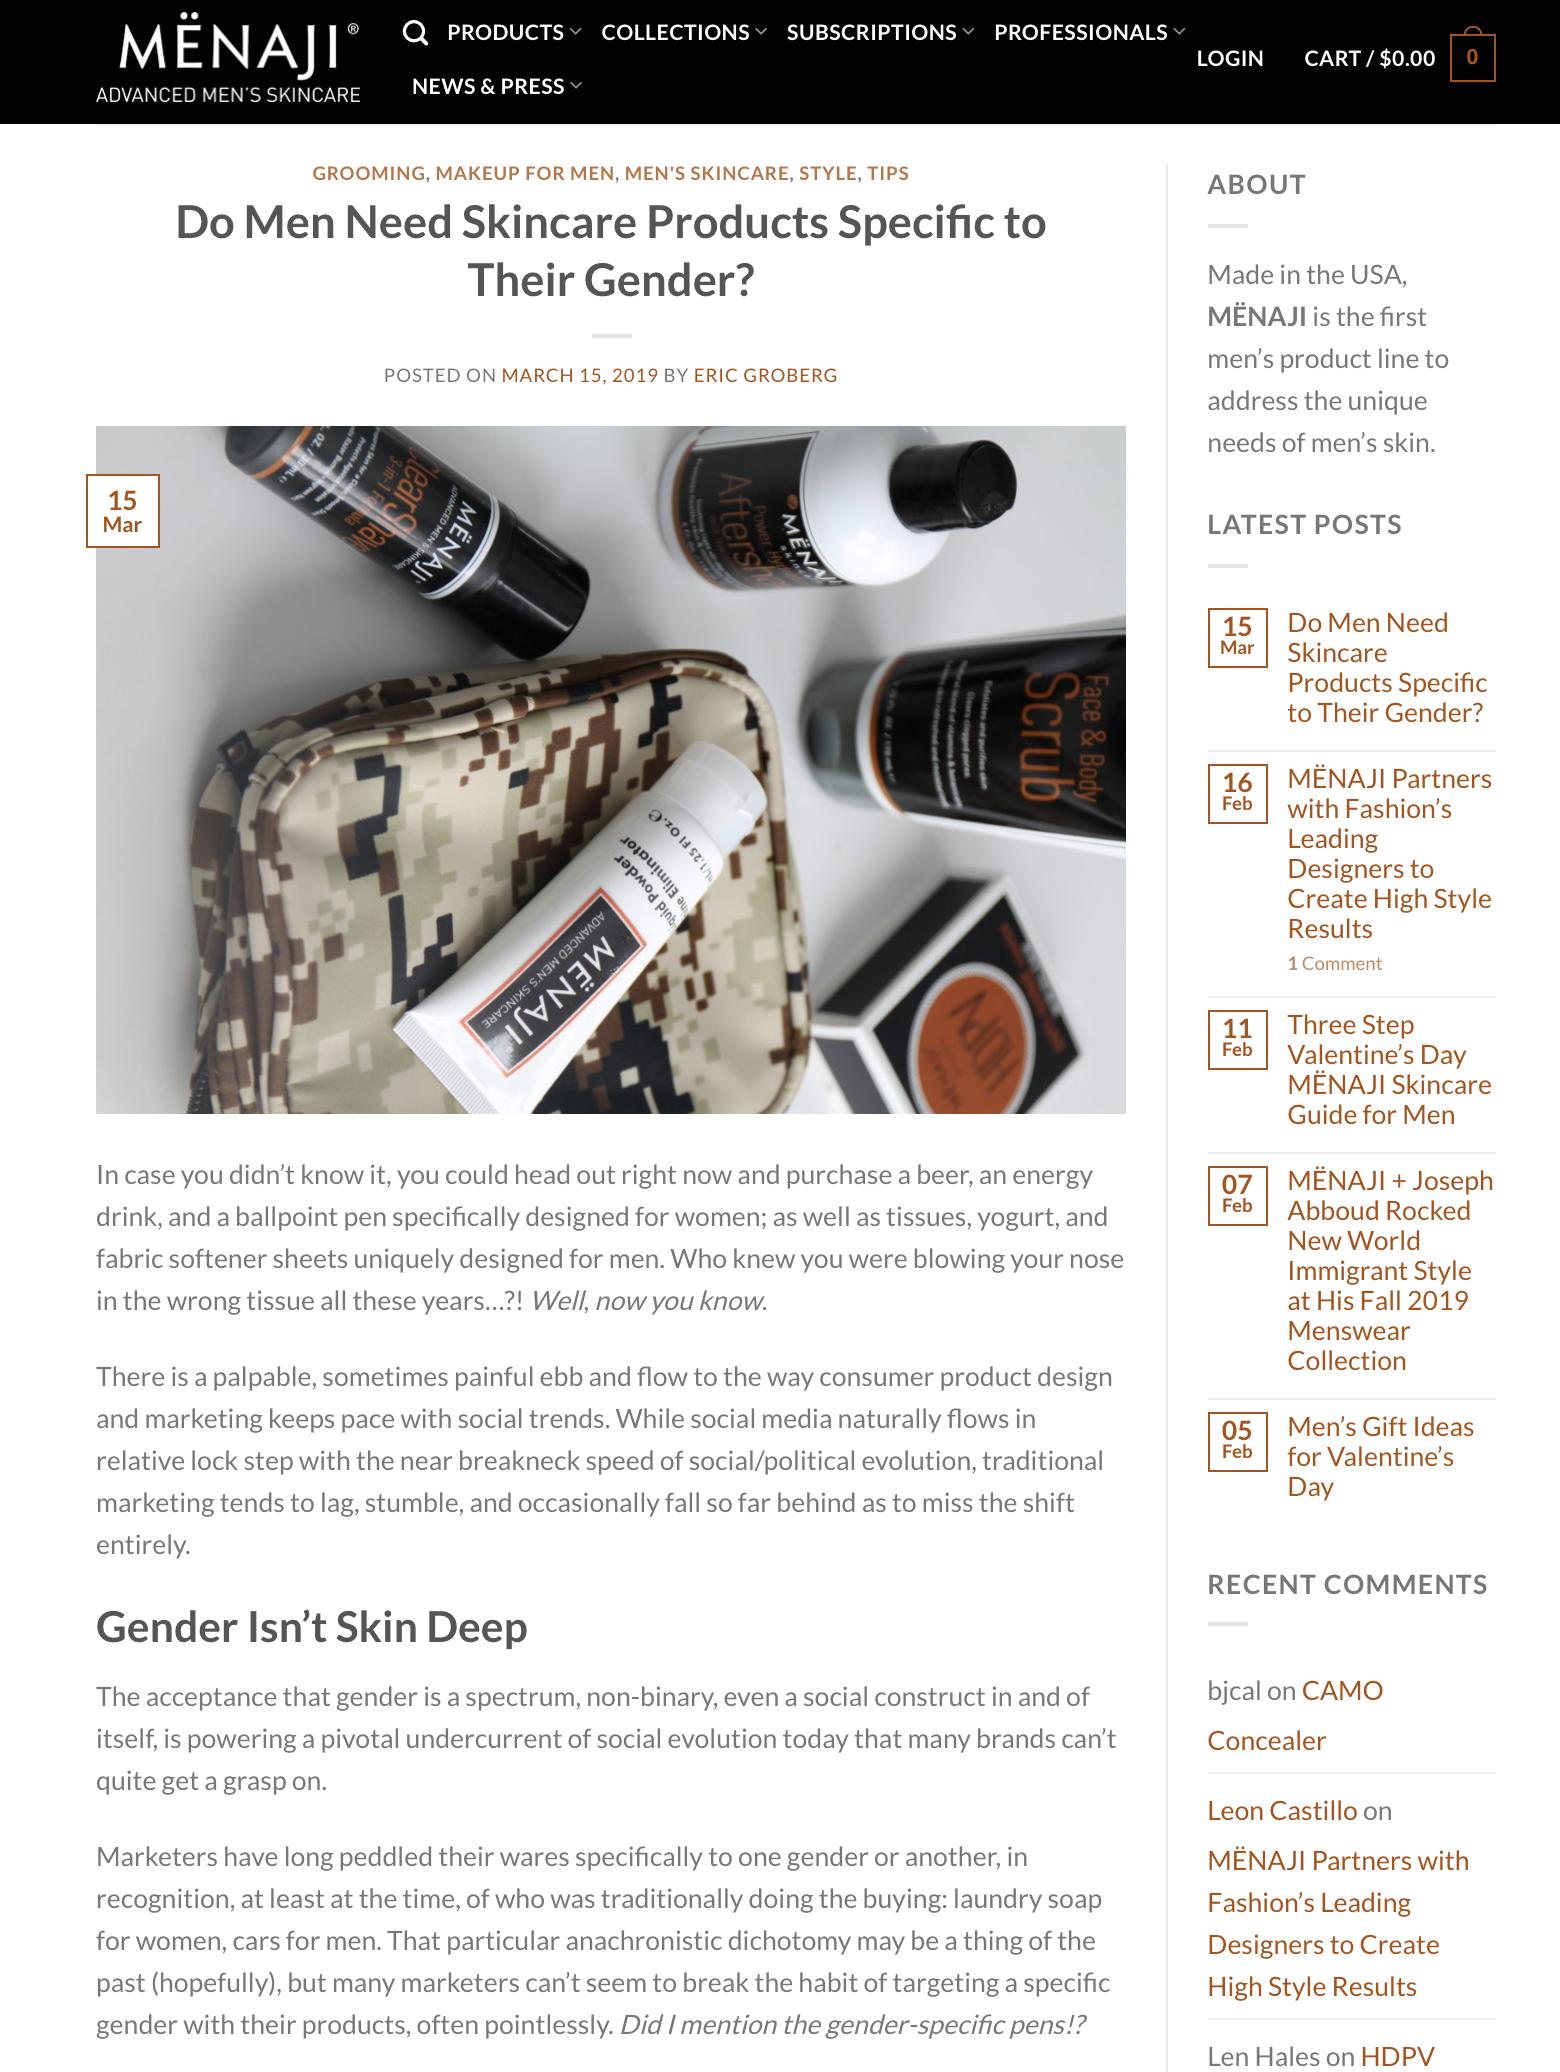 MENAJI: Advanced Men's Skincare